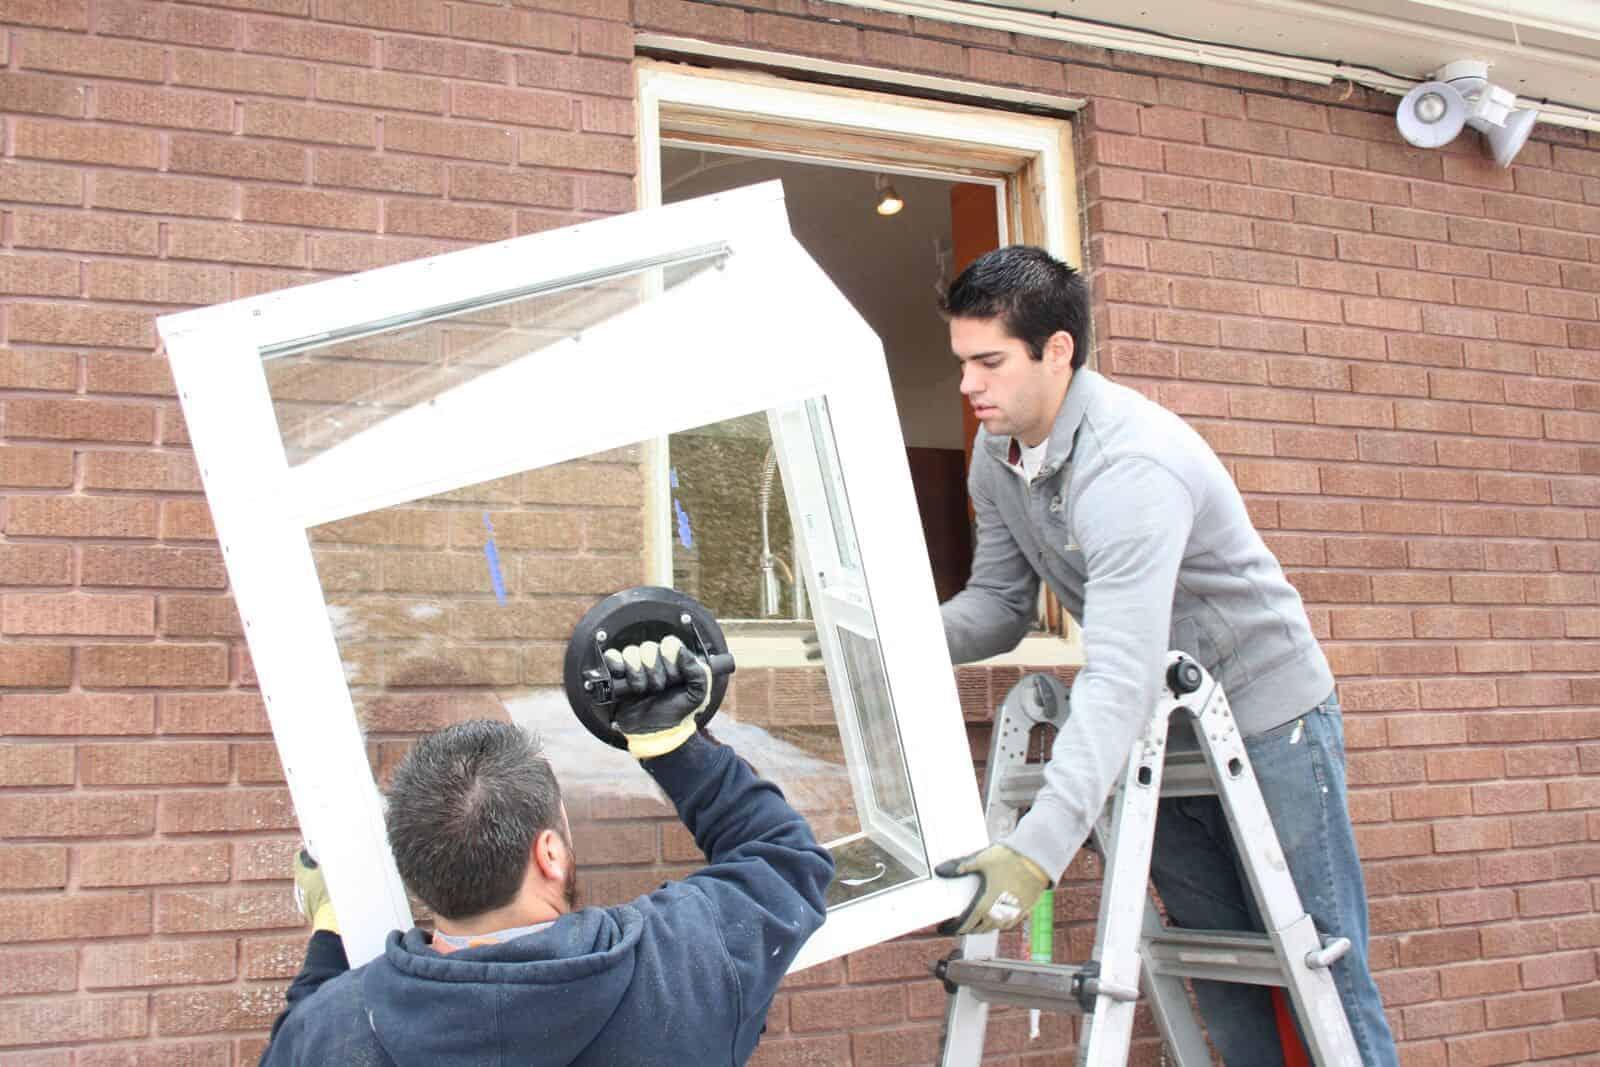 Jones Paint & Glass windows installers replace old house window in Utah residential home